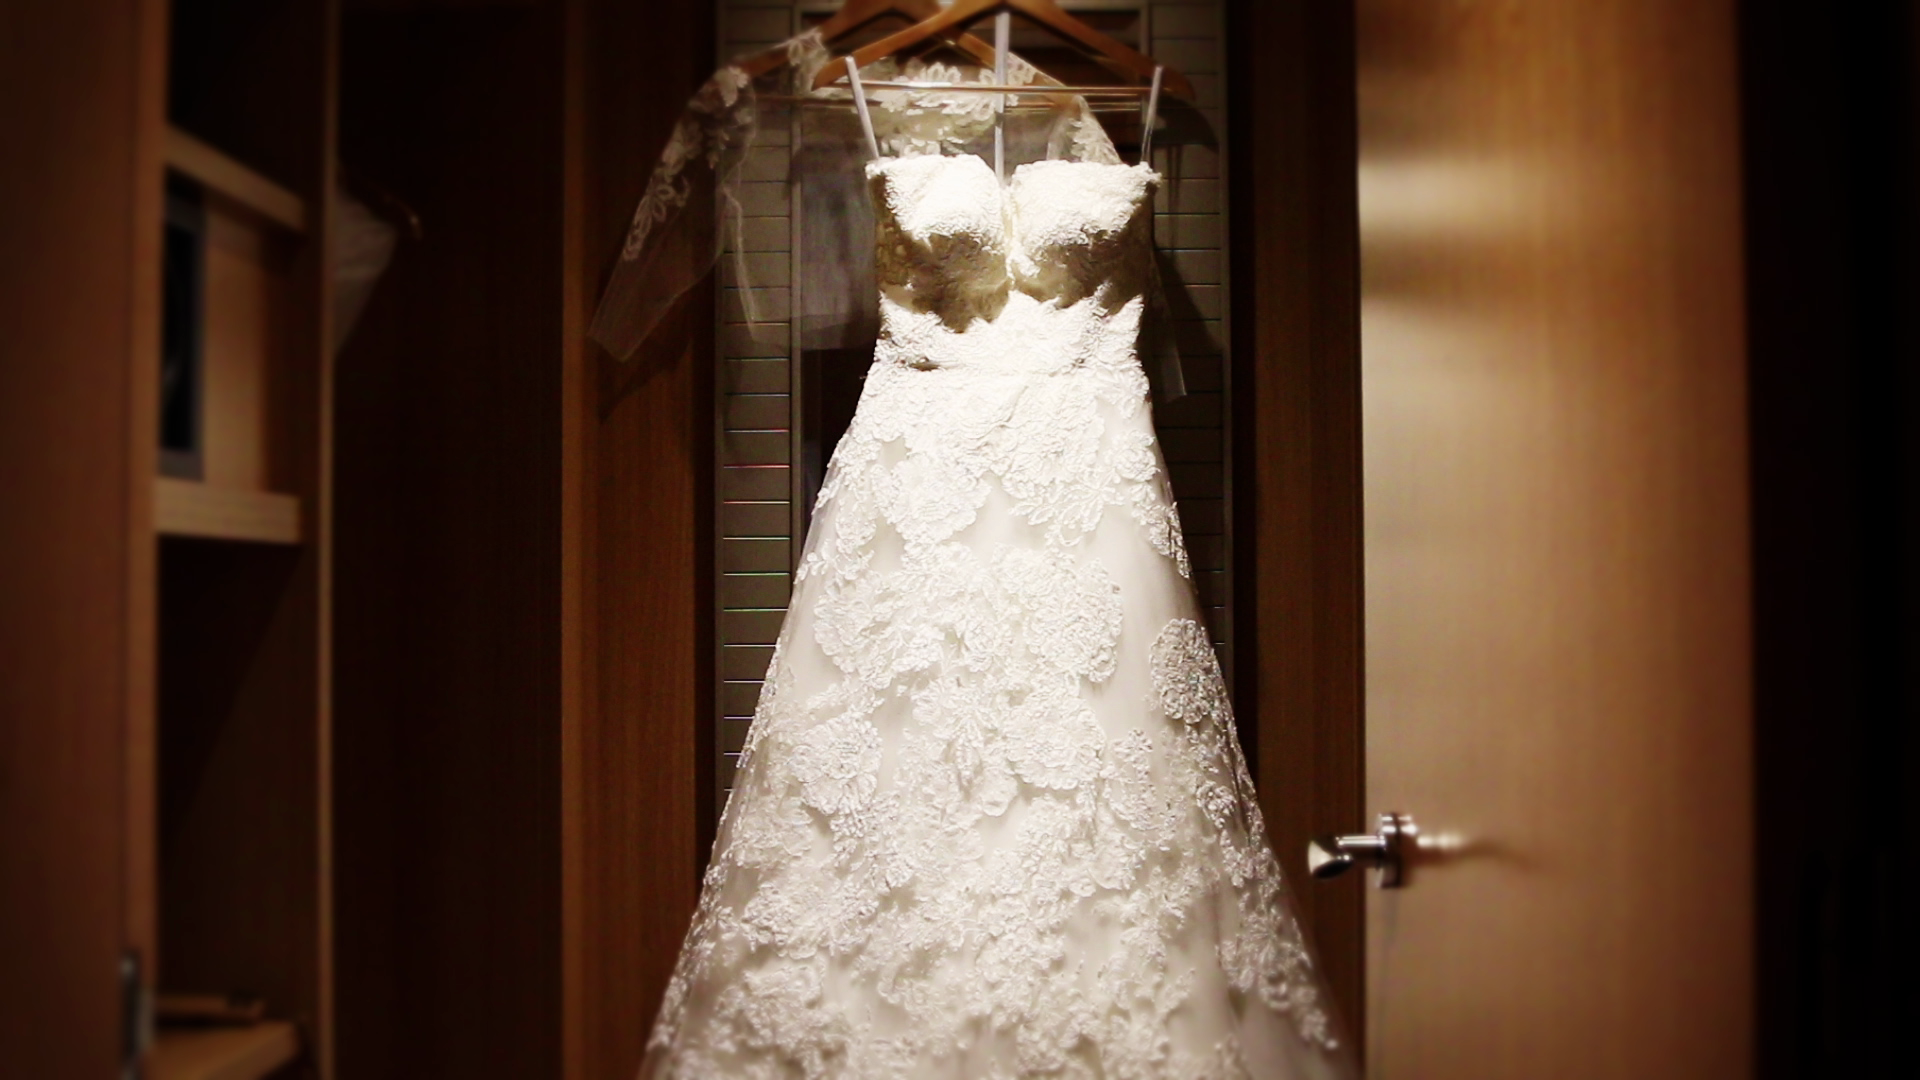 Wedding Videography - Victoria & Albert MuseumLondon